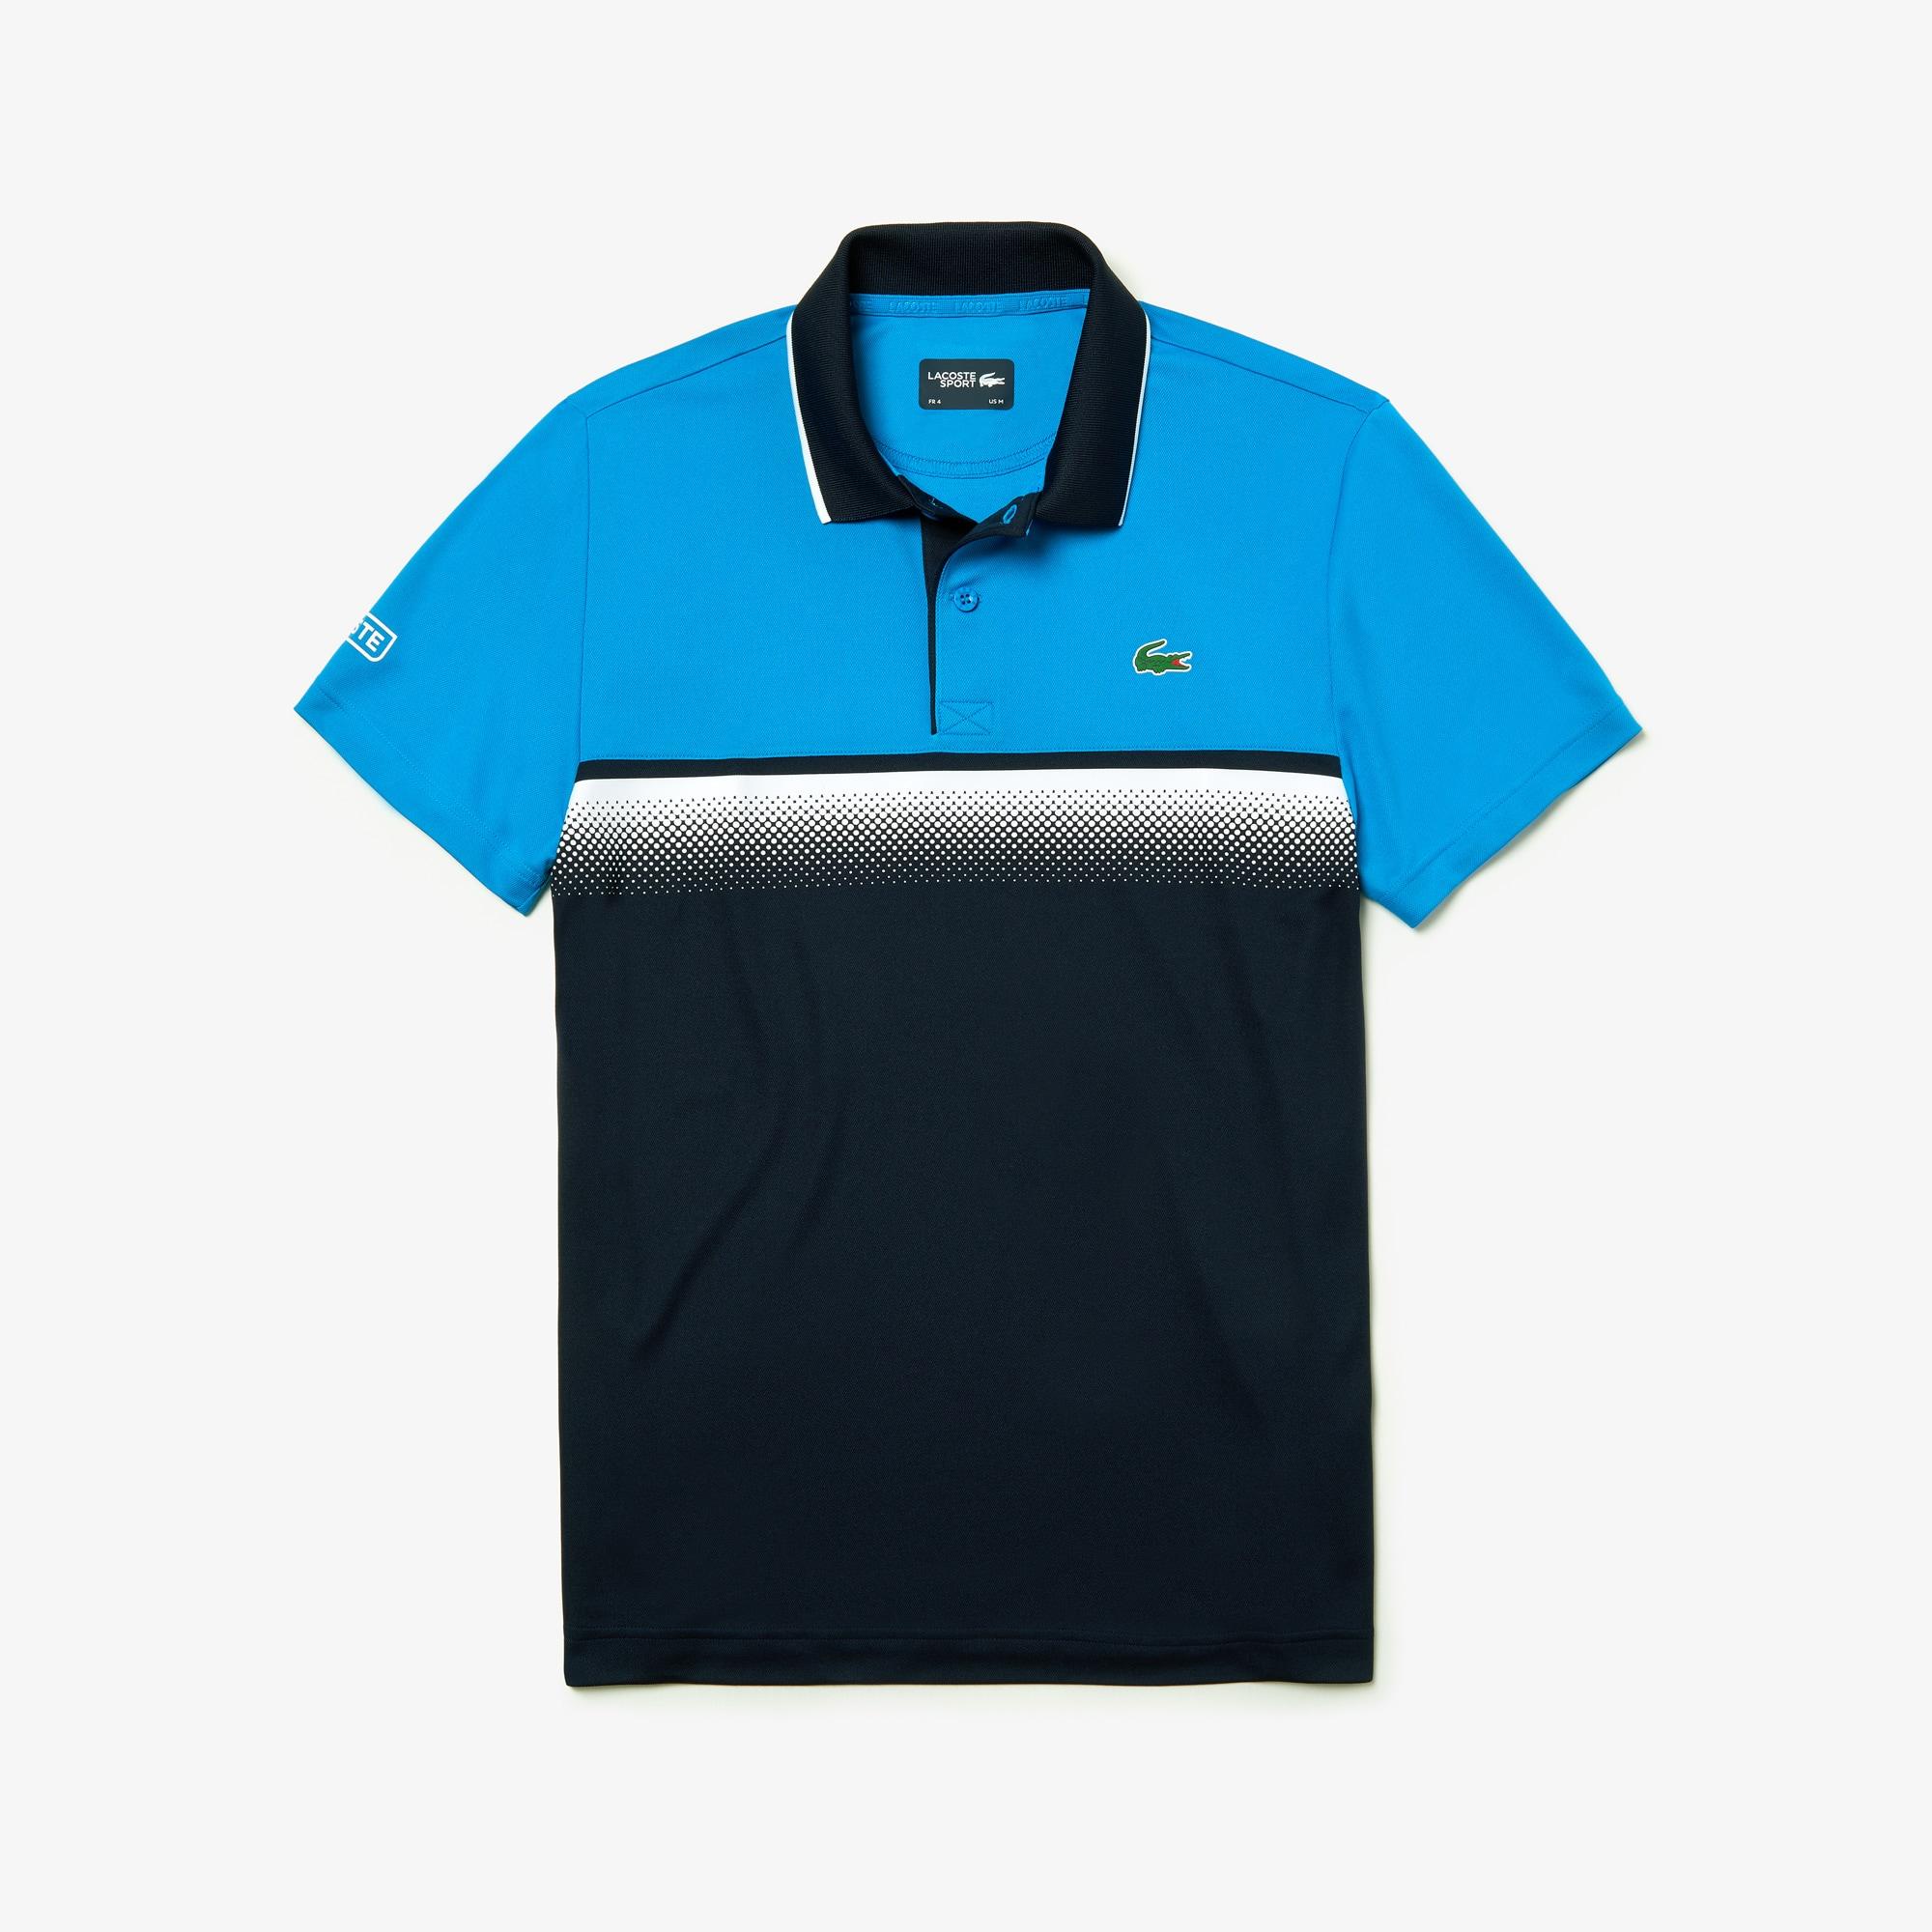 eb98a84c4a10d5 + 3 colors · Men s Lacoste SPORT Shaded Colourblock Technical Piqué Tennis Polo  Shirt